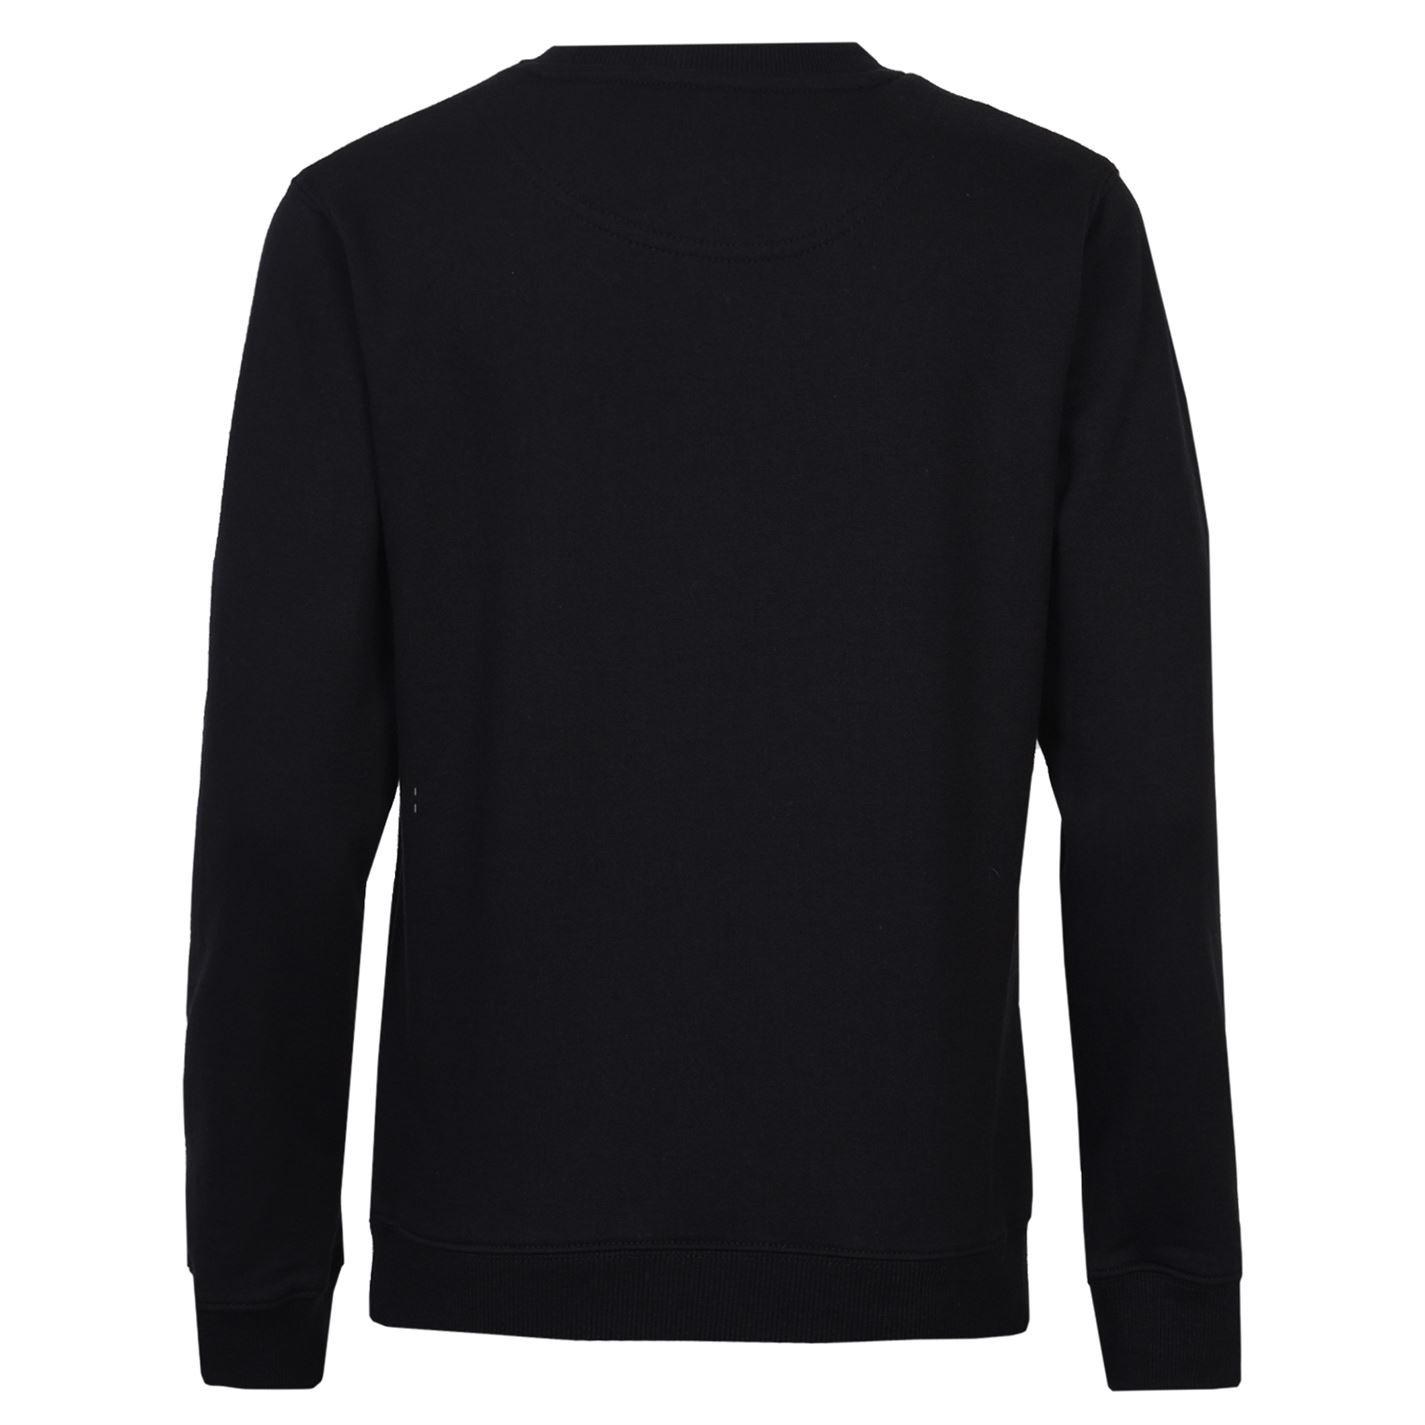 Lyle and Scott Kids Basic Crew Fleece Sweatshirt Sweater T Top Jumper Pullover